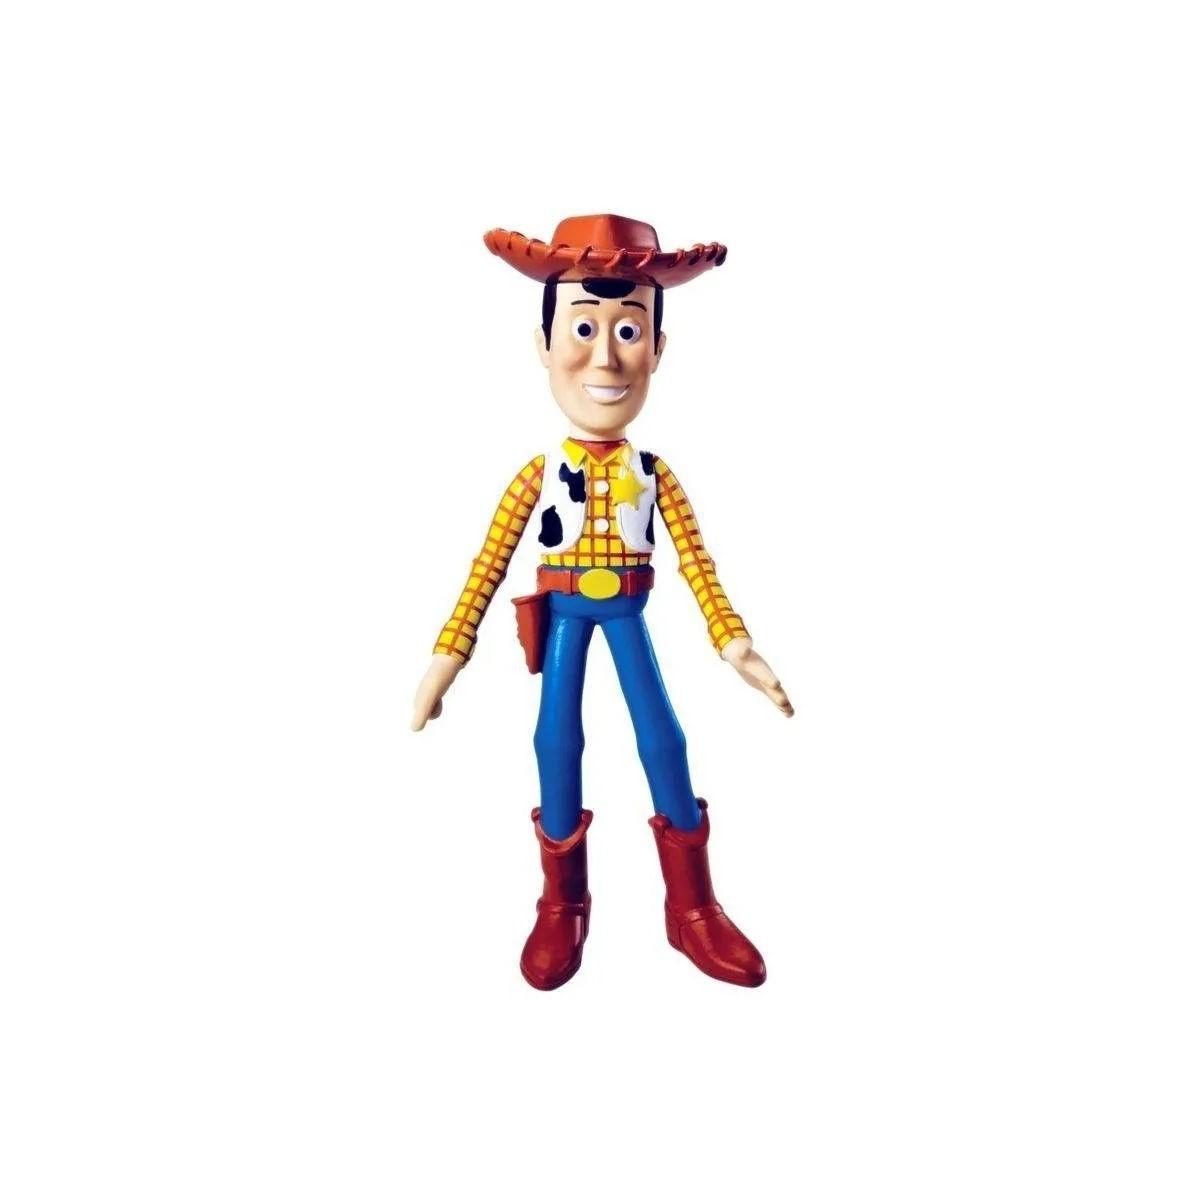 Boneco Vinil Woody Toy Story